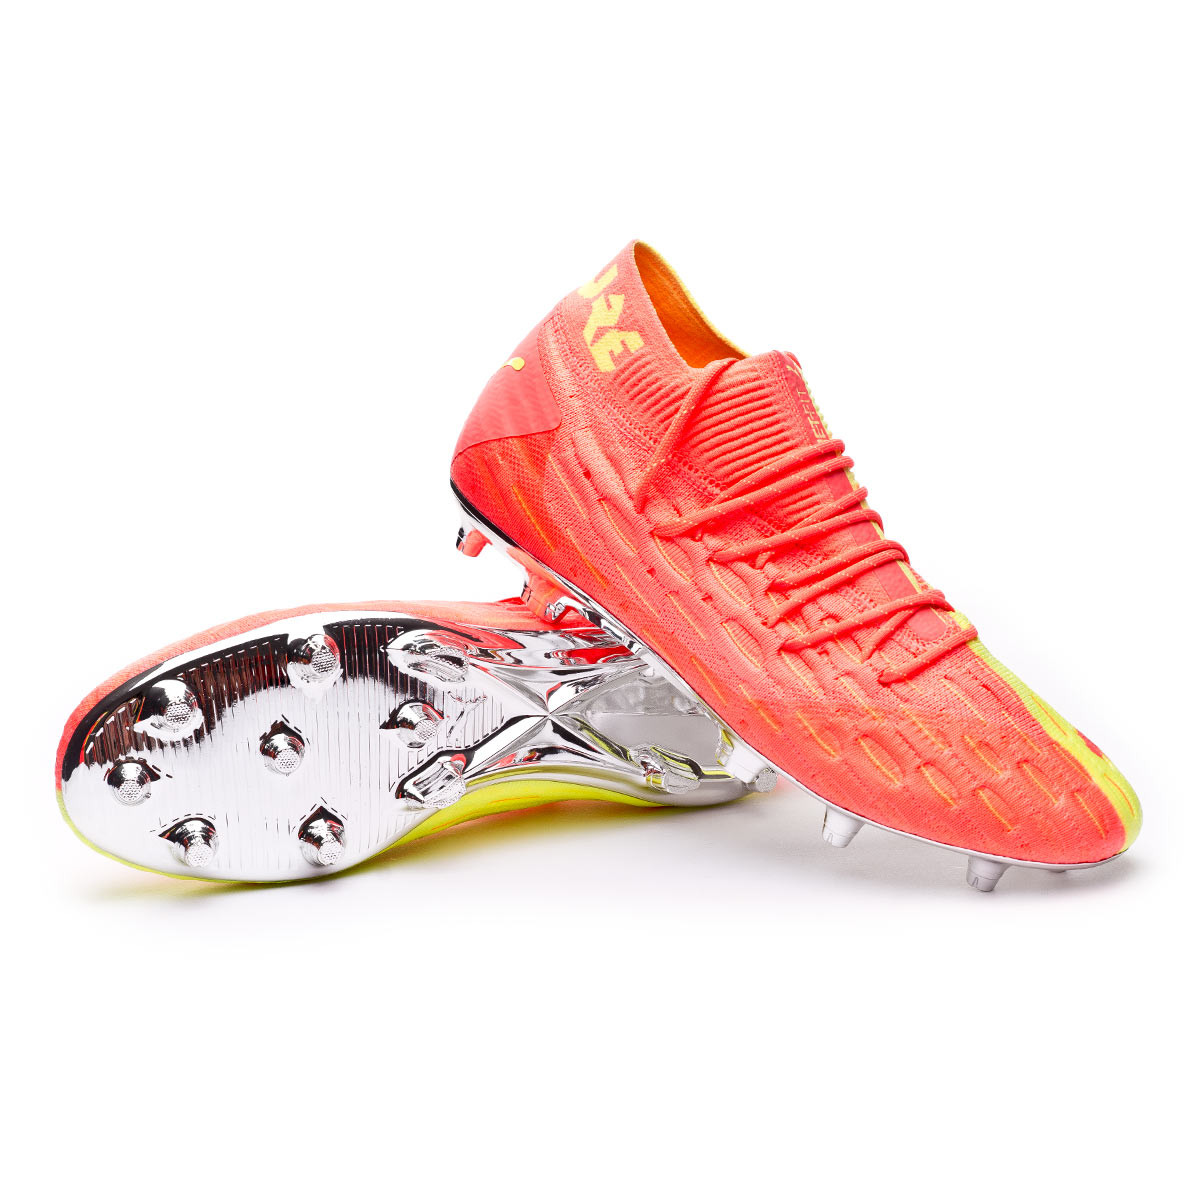 Puma Future 5.1 NETFIT FG/AG OSG Football Boots